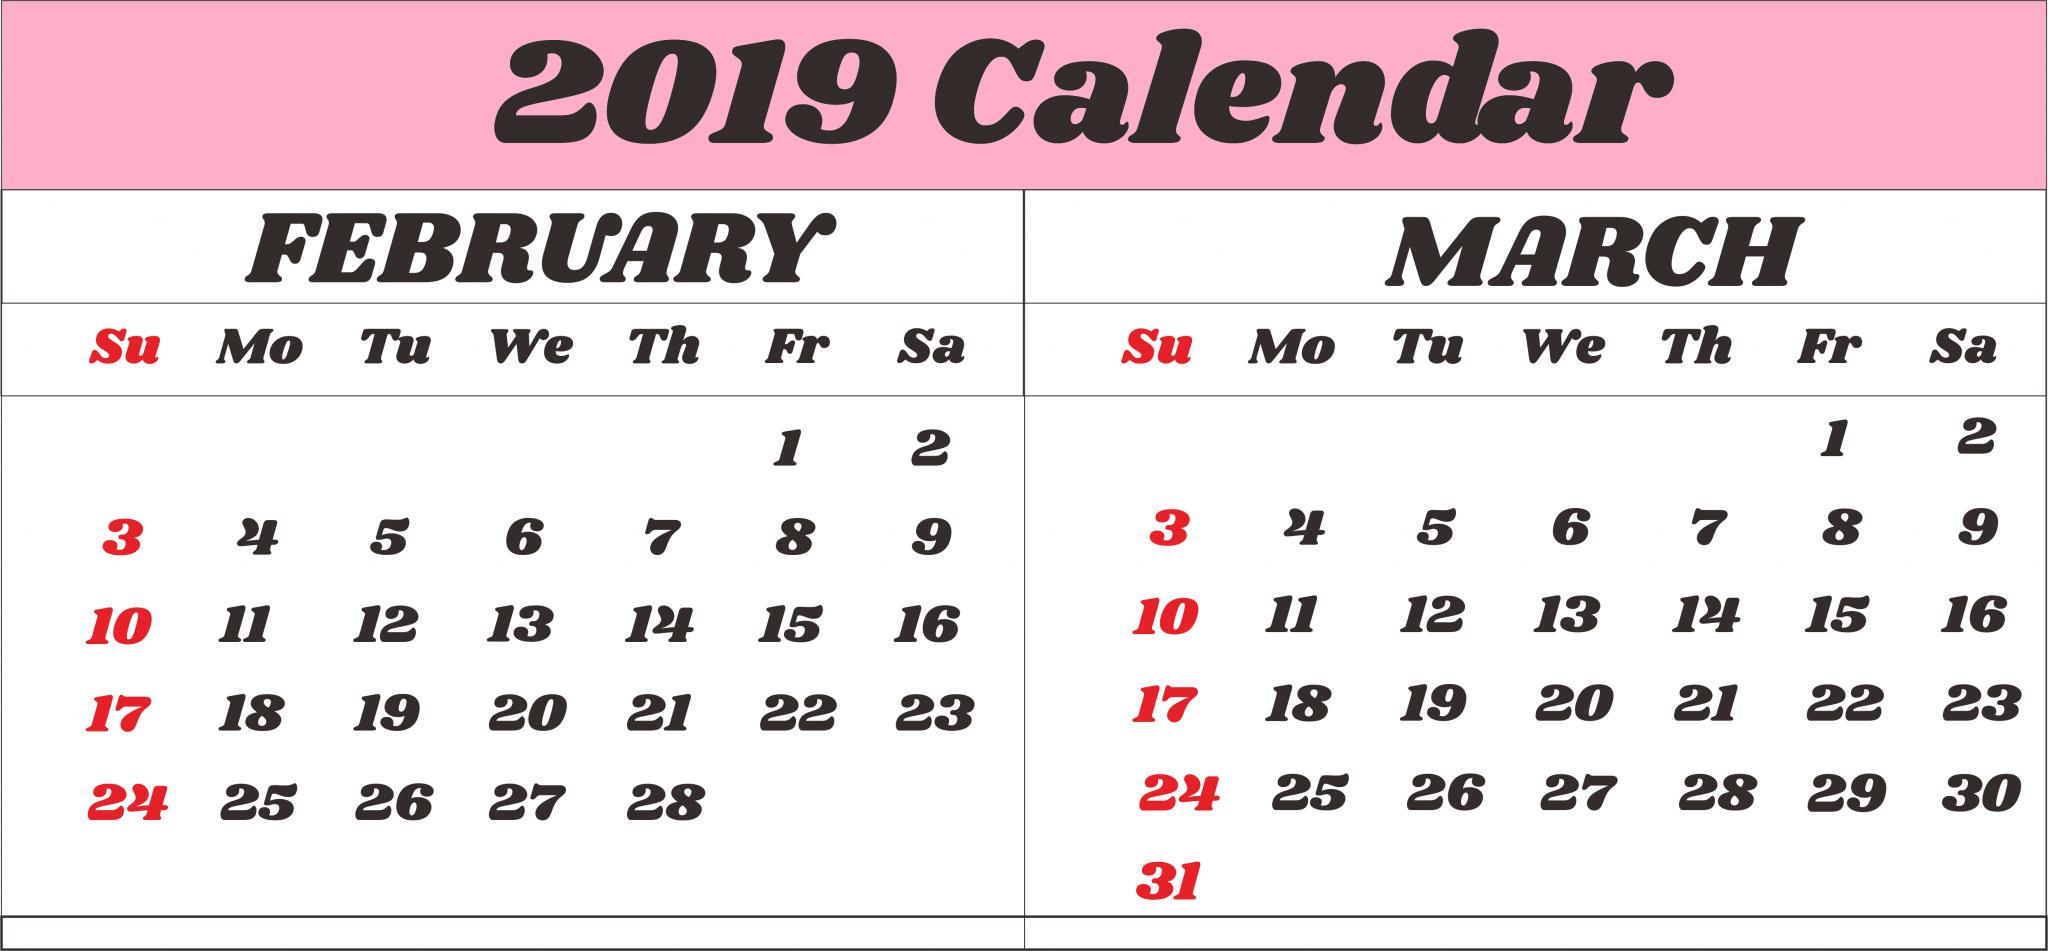 Calendar February March 2019